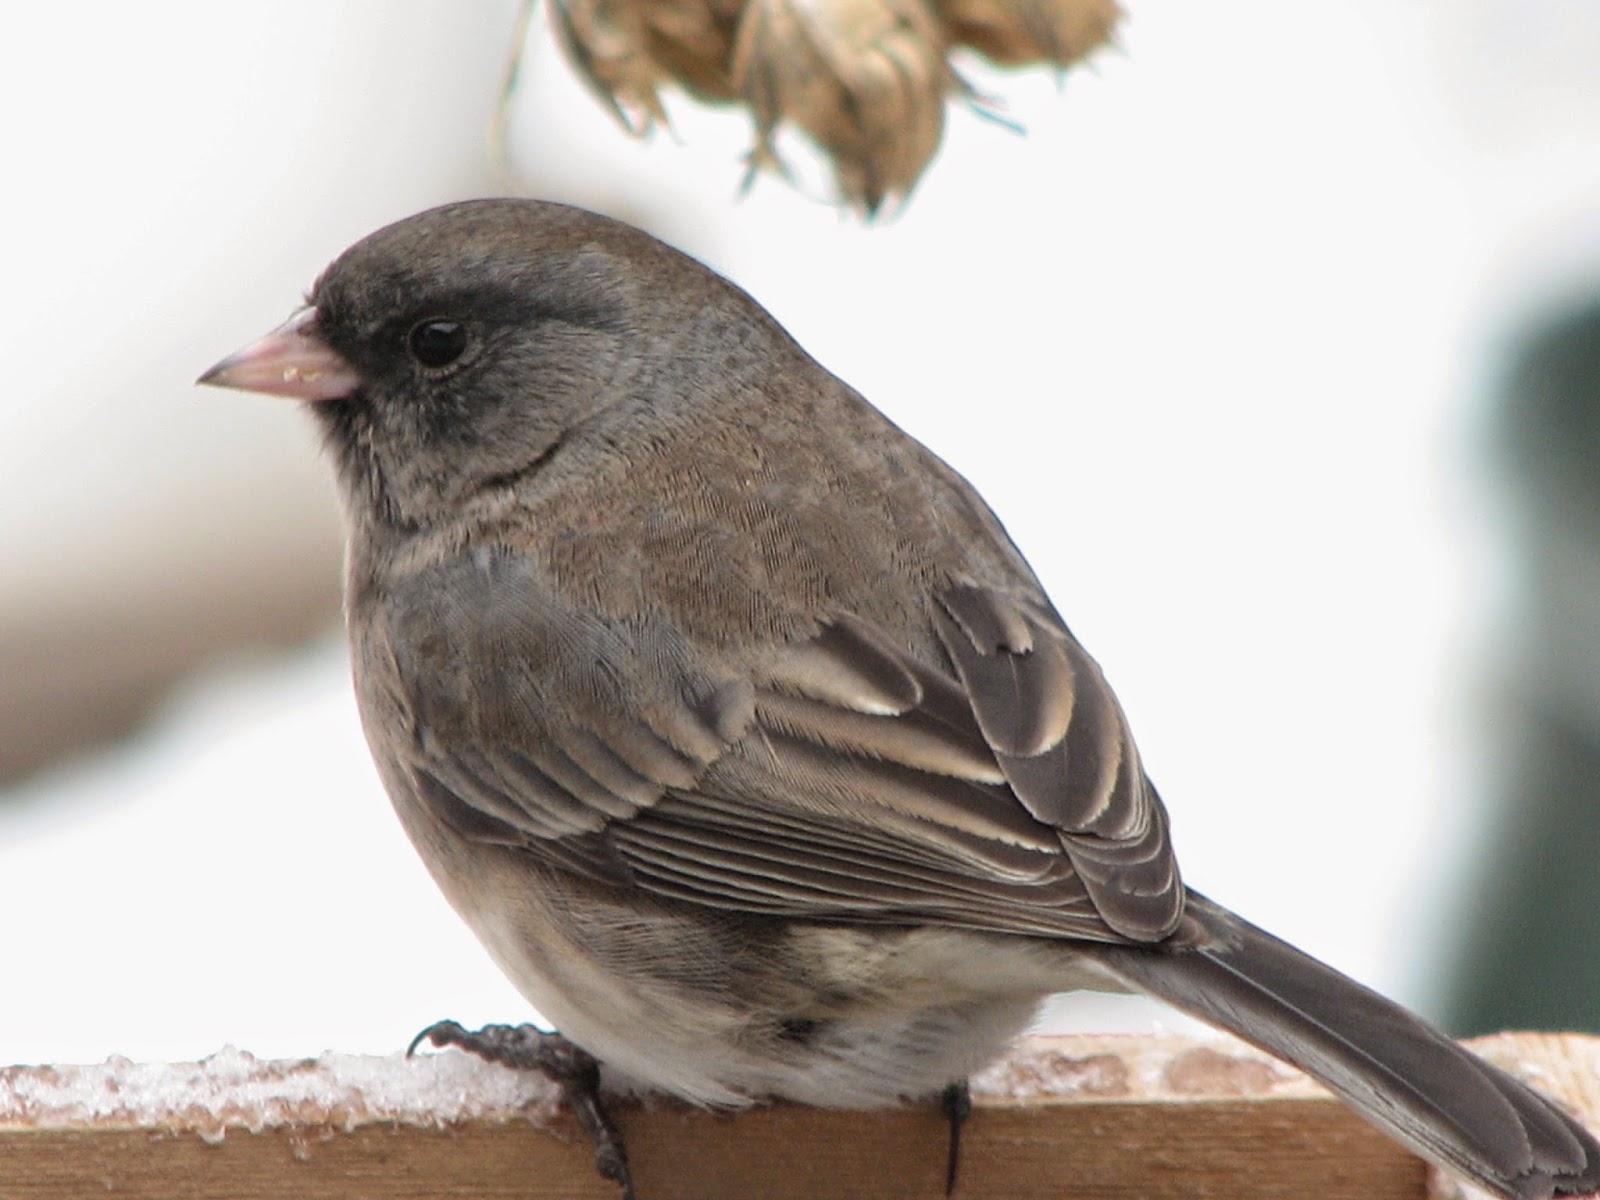 South Burlington Birds: Dark-eyed Junco Photos